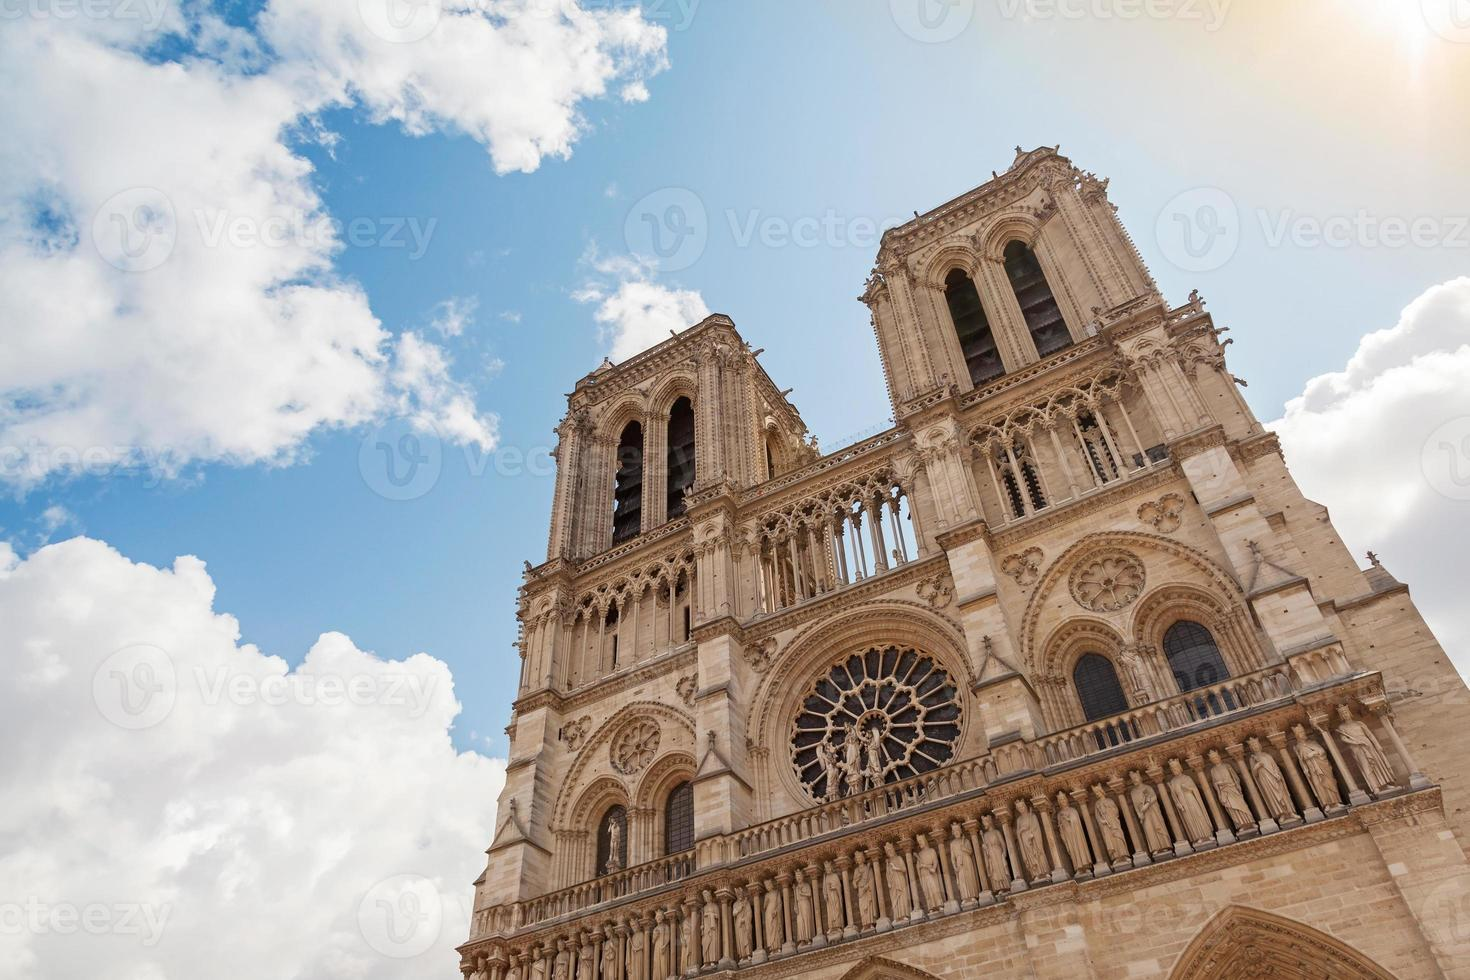 fasad av Notre Dame de Paris-katedralen, Frankrike foto